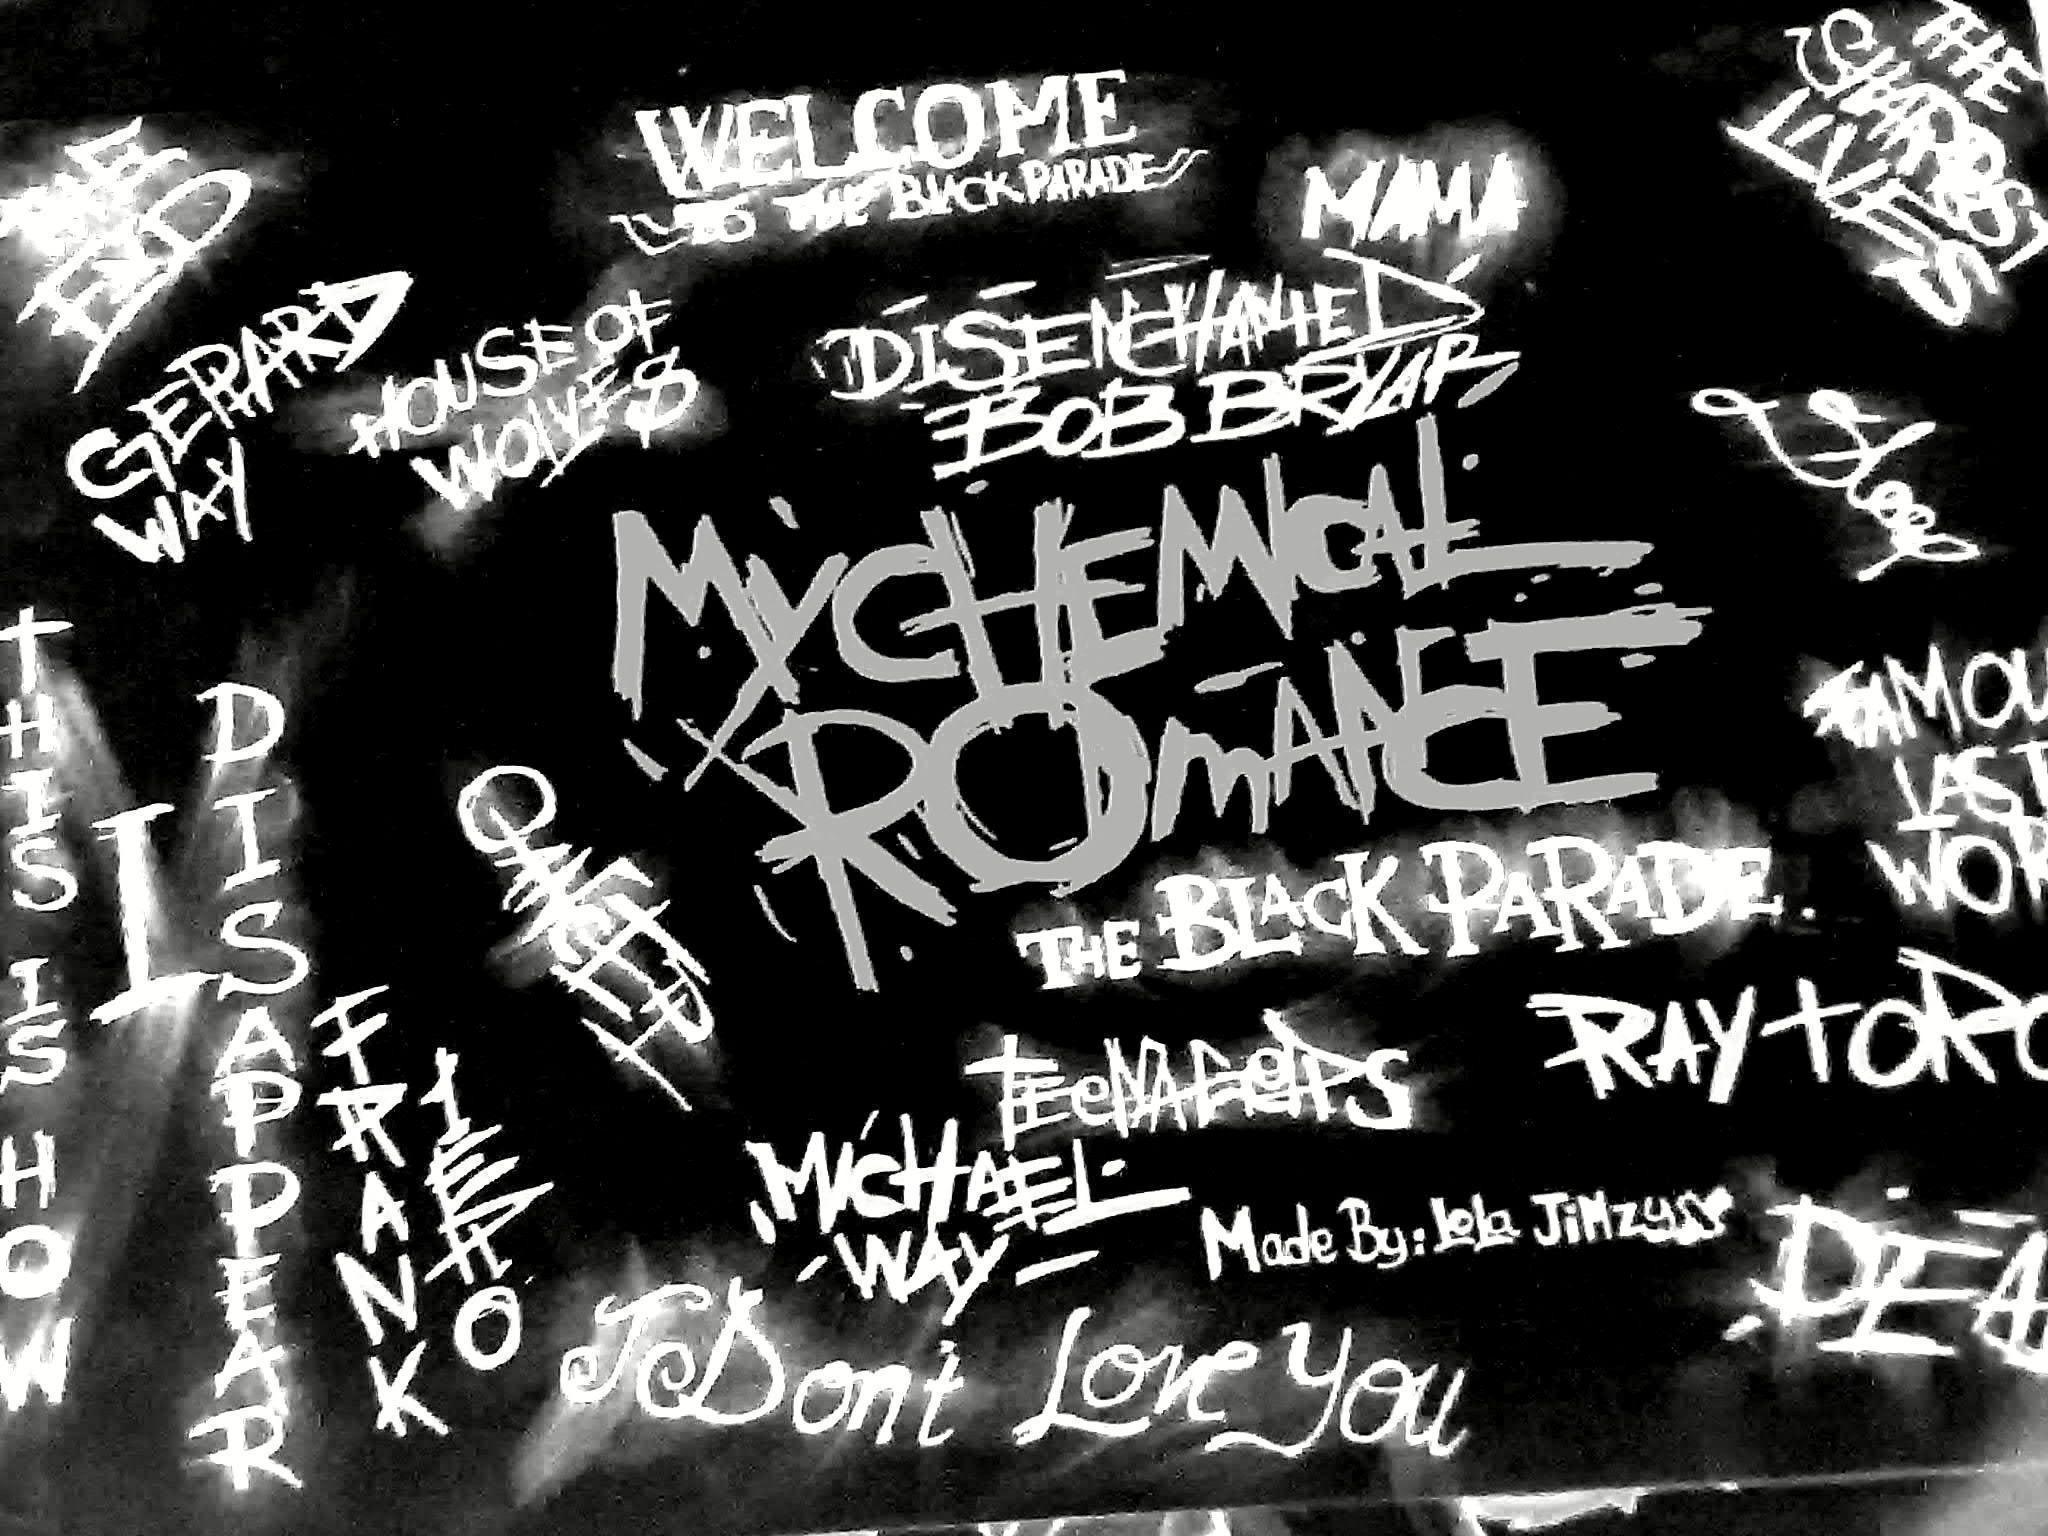 My Chemical Romance Blackboard Image